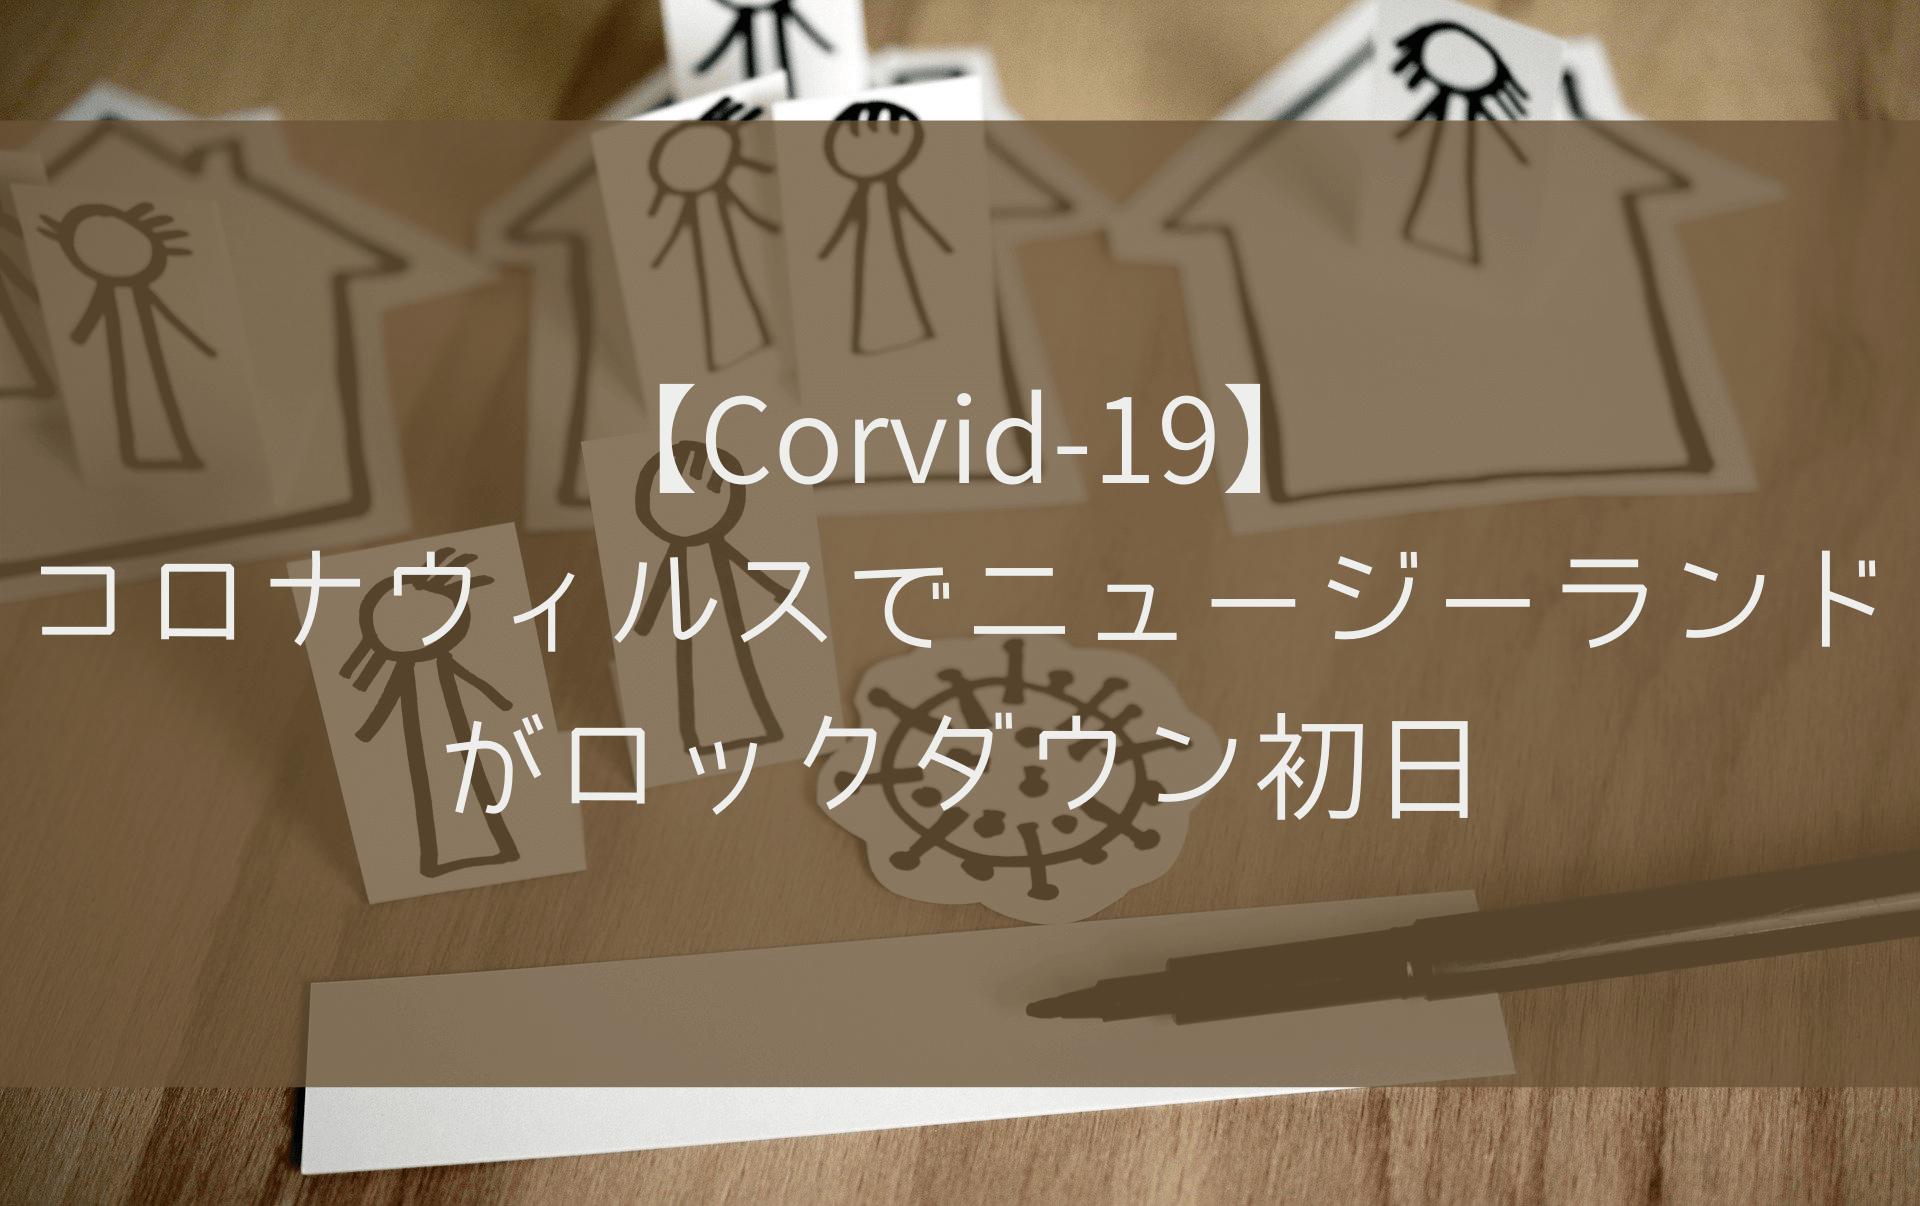 【Corvid-19】コロナウィルスでニュージーランドがロックダウン初日